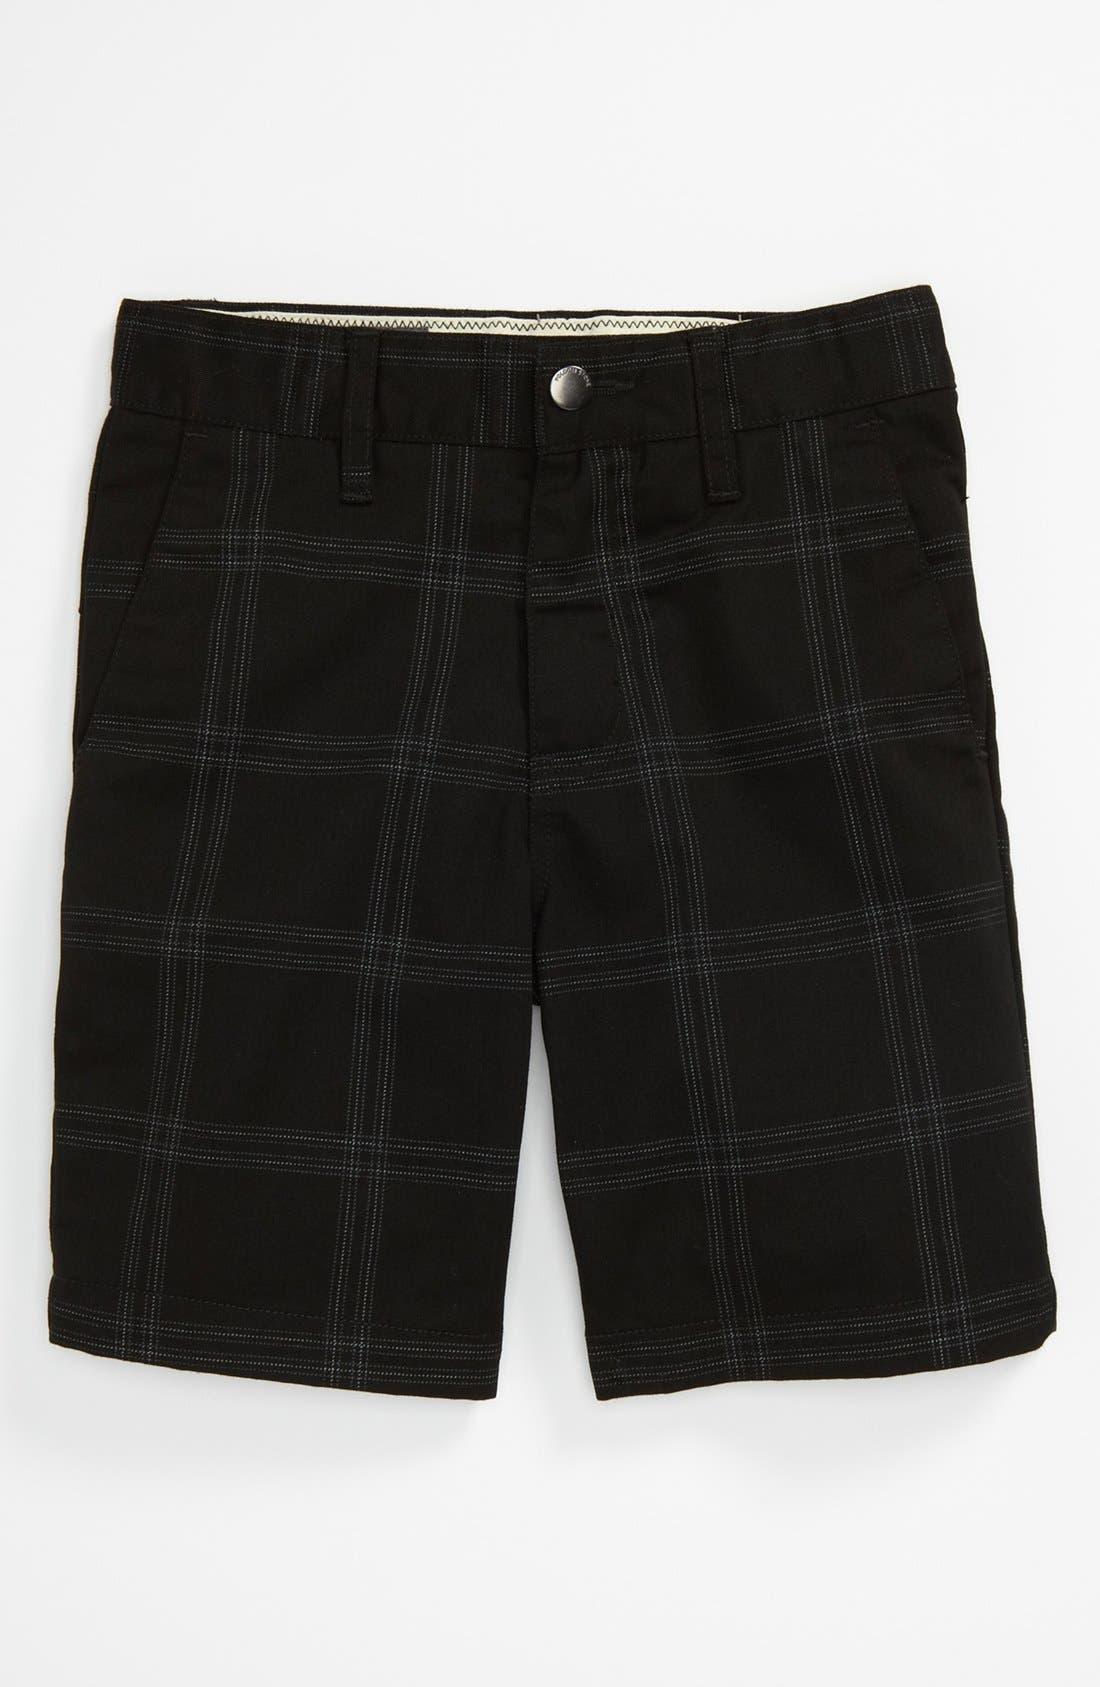 Alternate Image 1 Selected - Volcom Plaid Shorts (Little Boys)